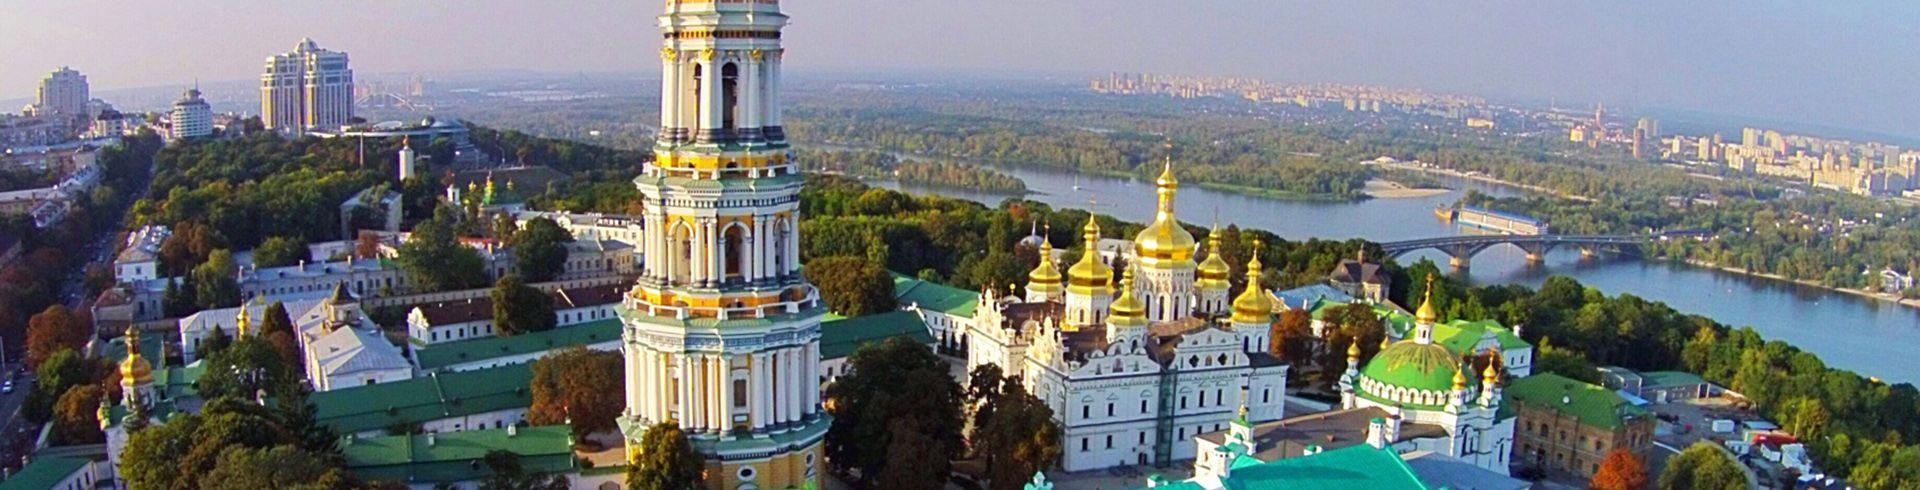 Gratuit datant en ligne Ukraine